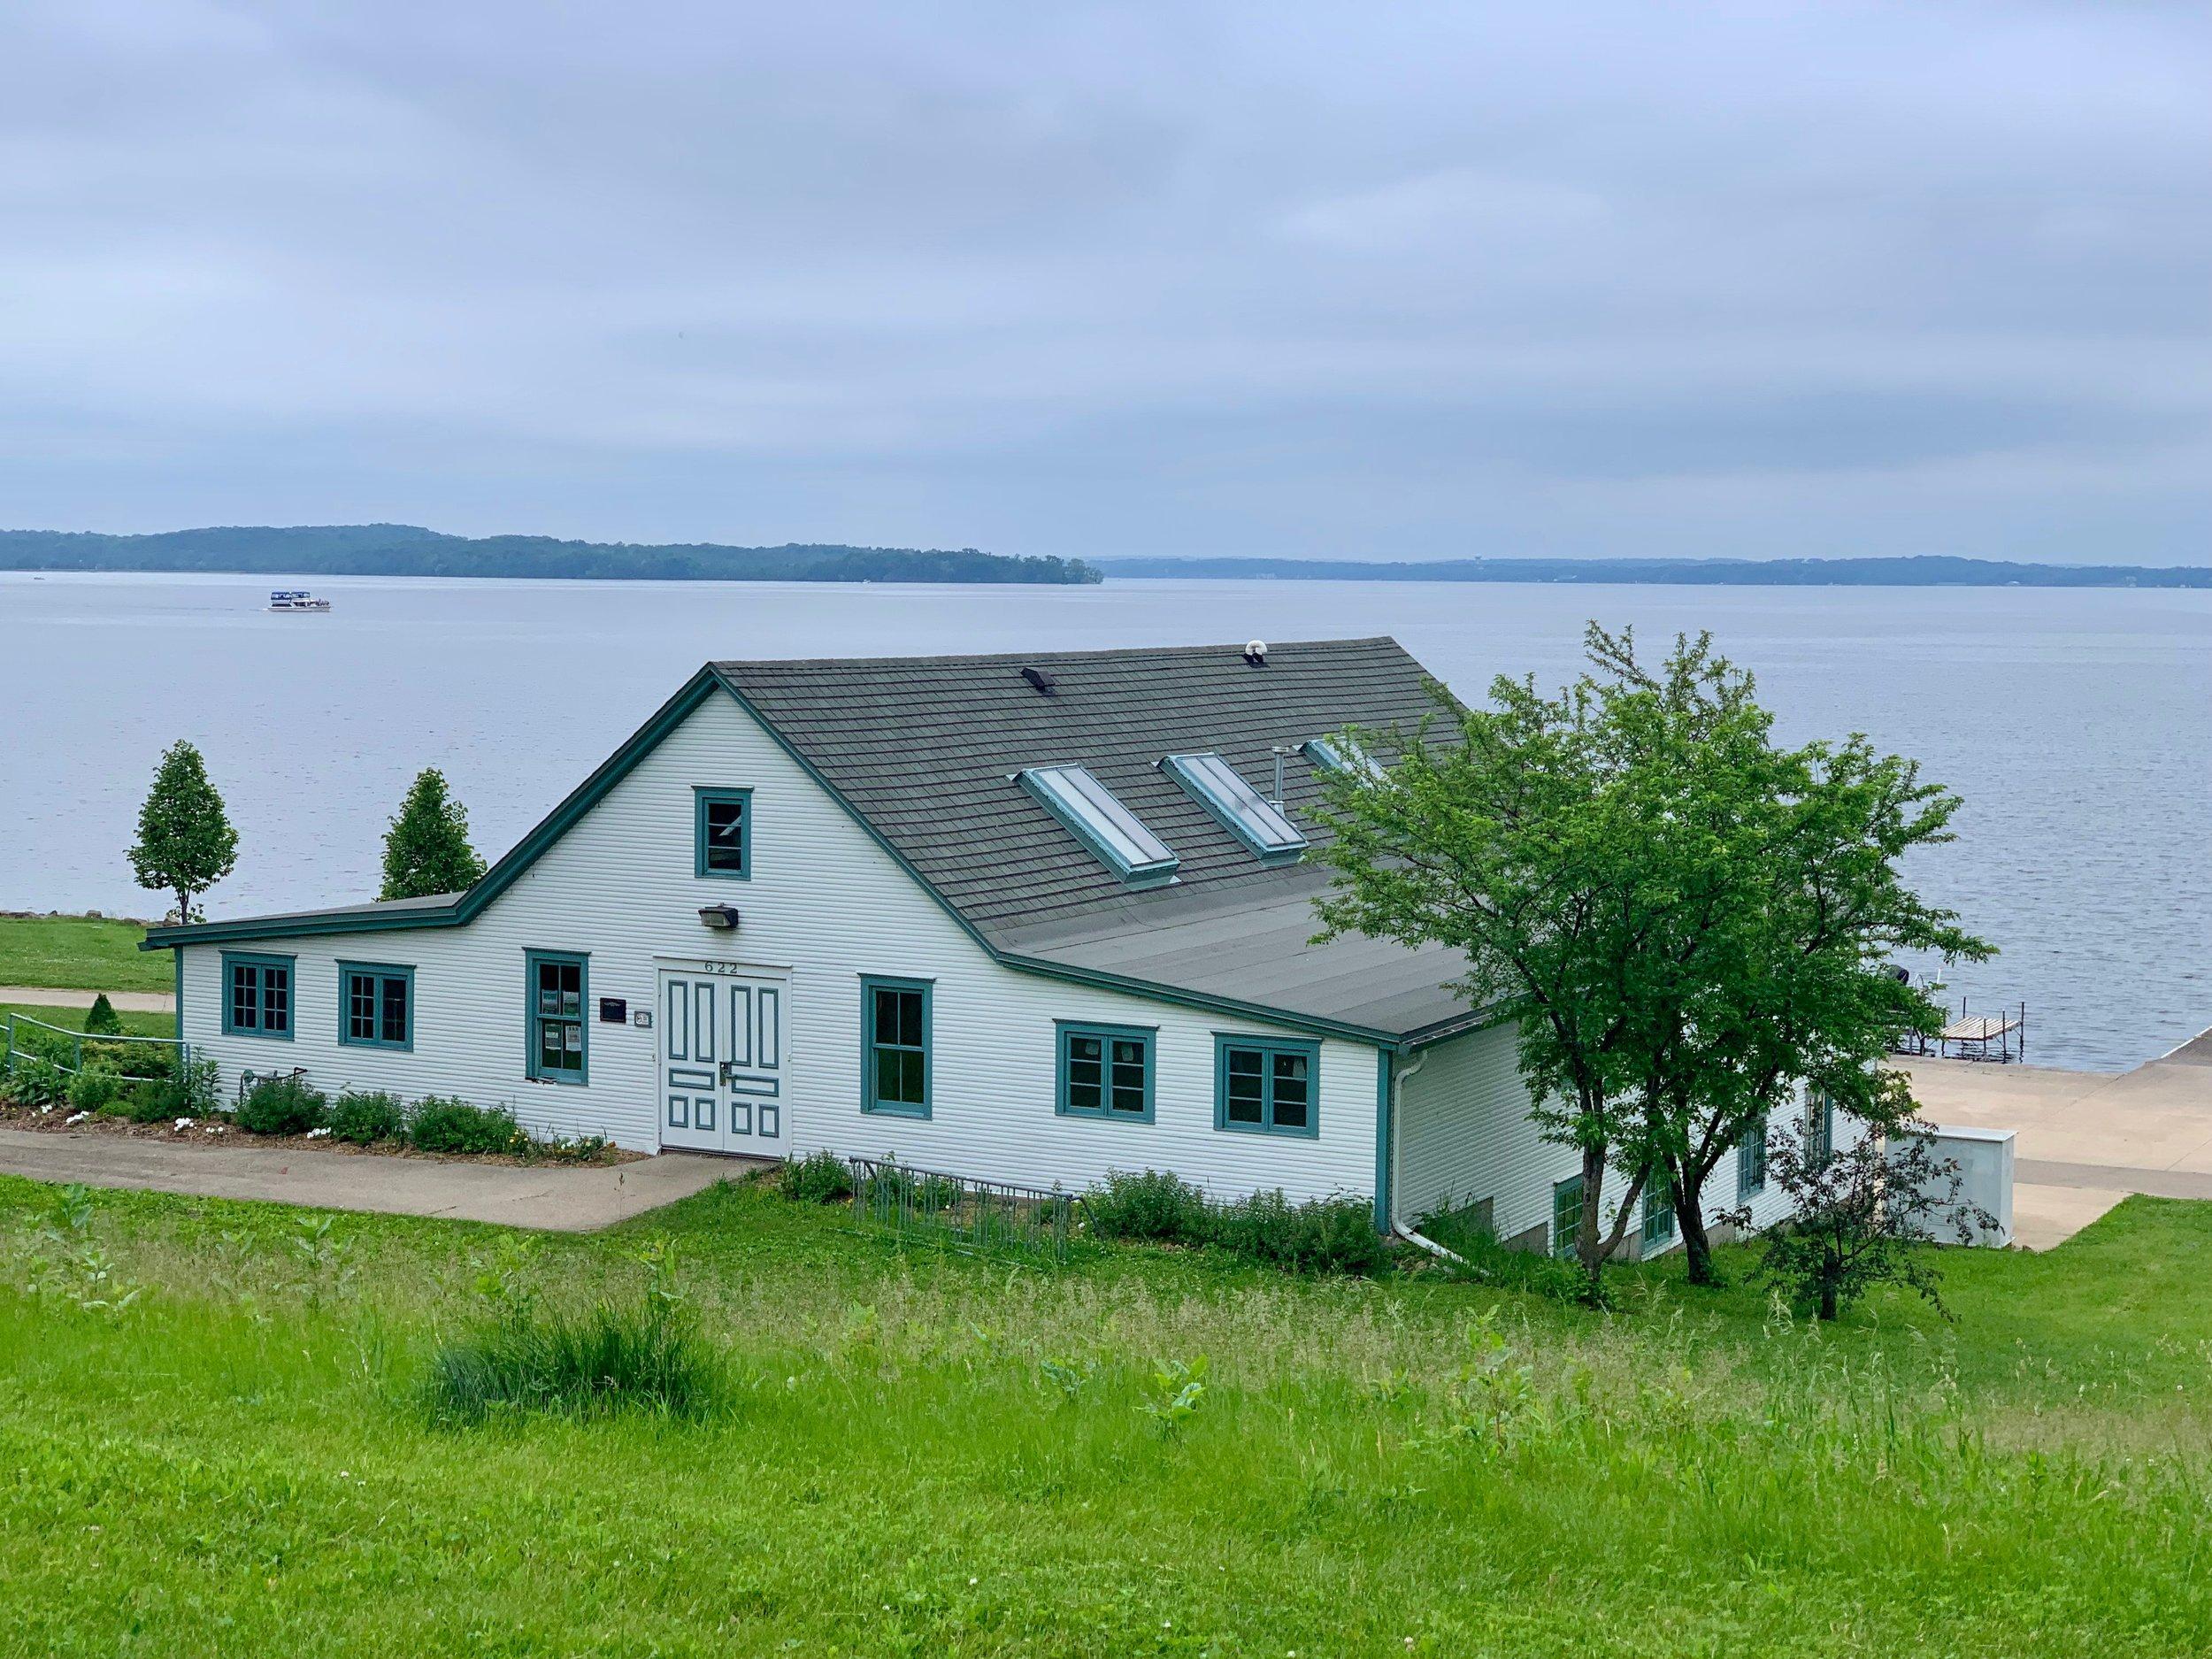 Bernard-Hoover Boathouse